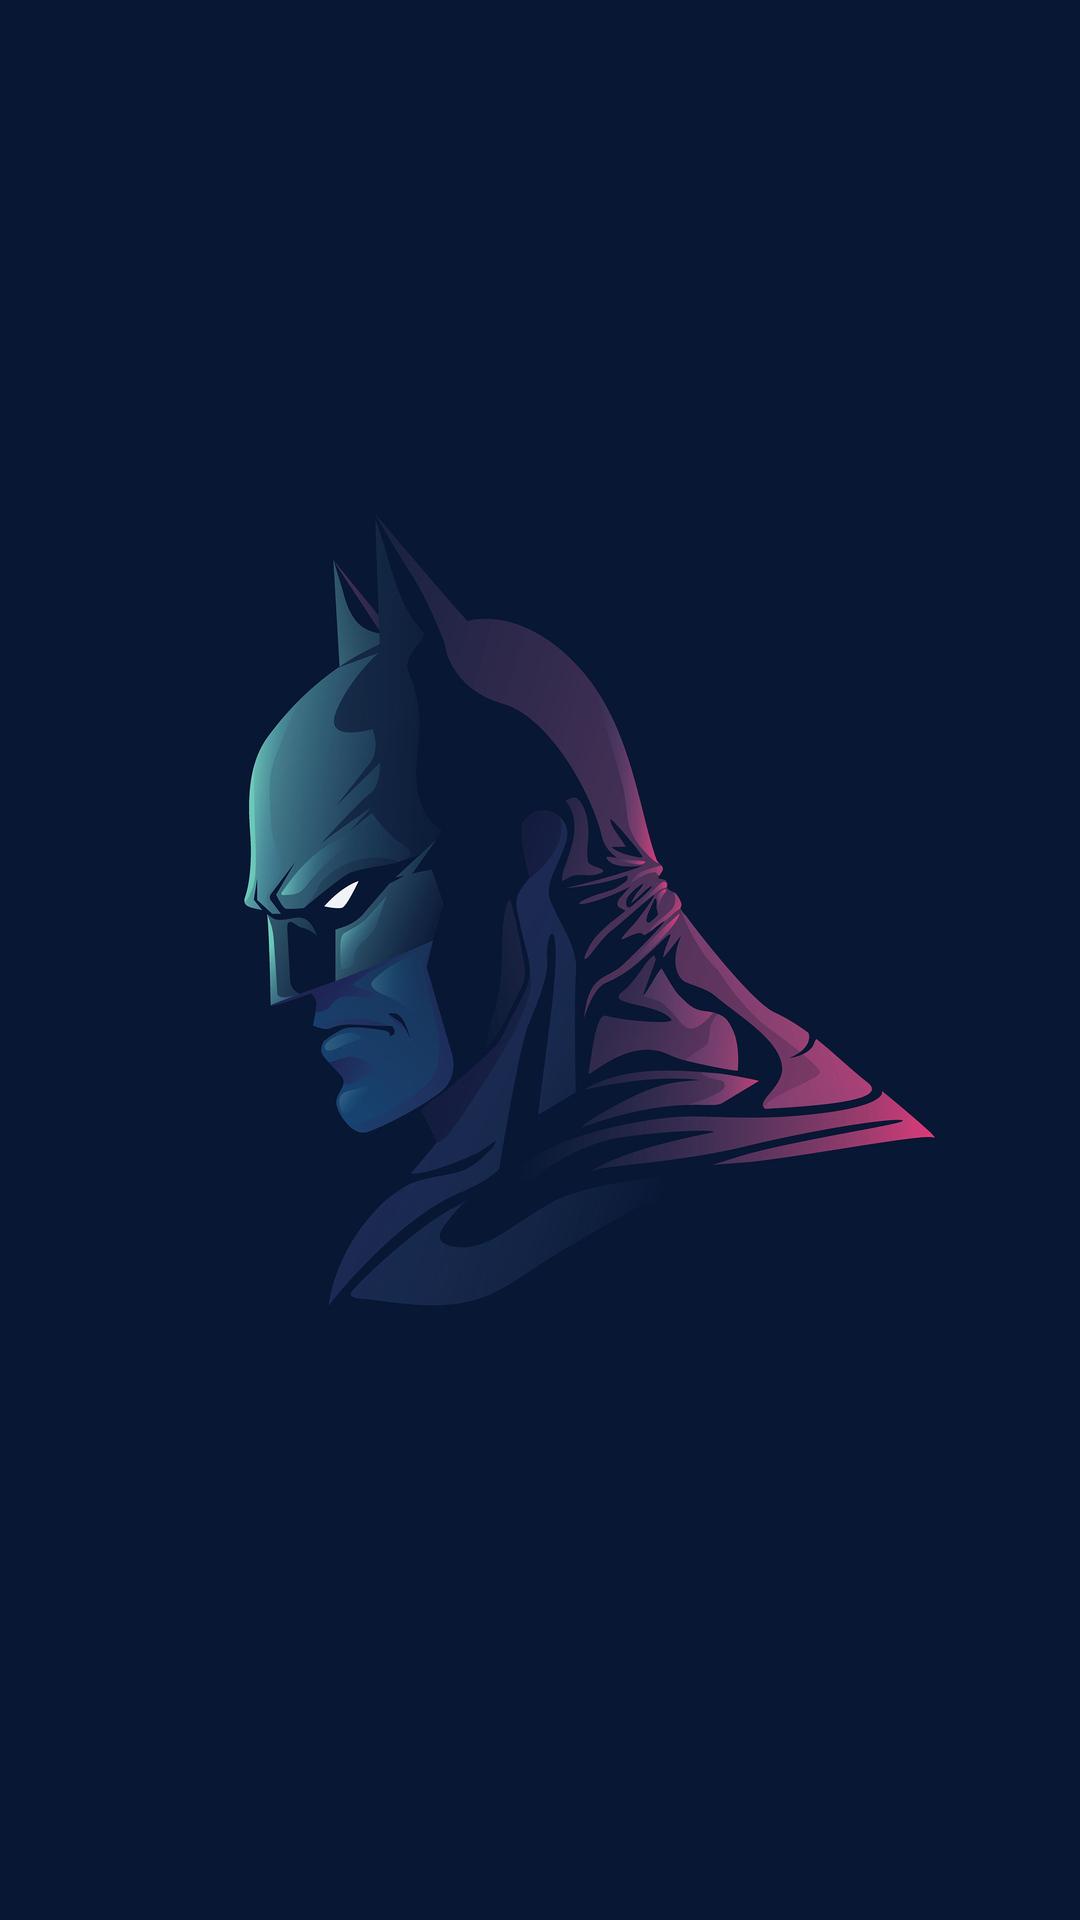 batman-the-dark-knight-minimal-ac.jpg